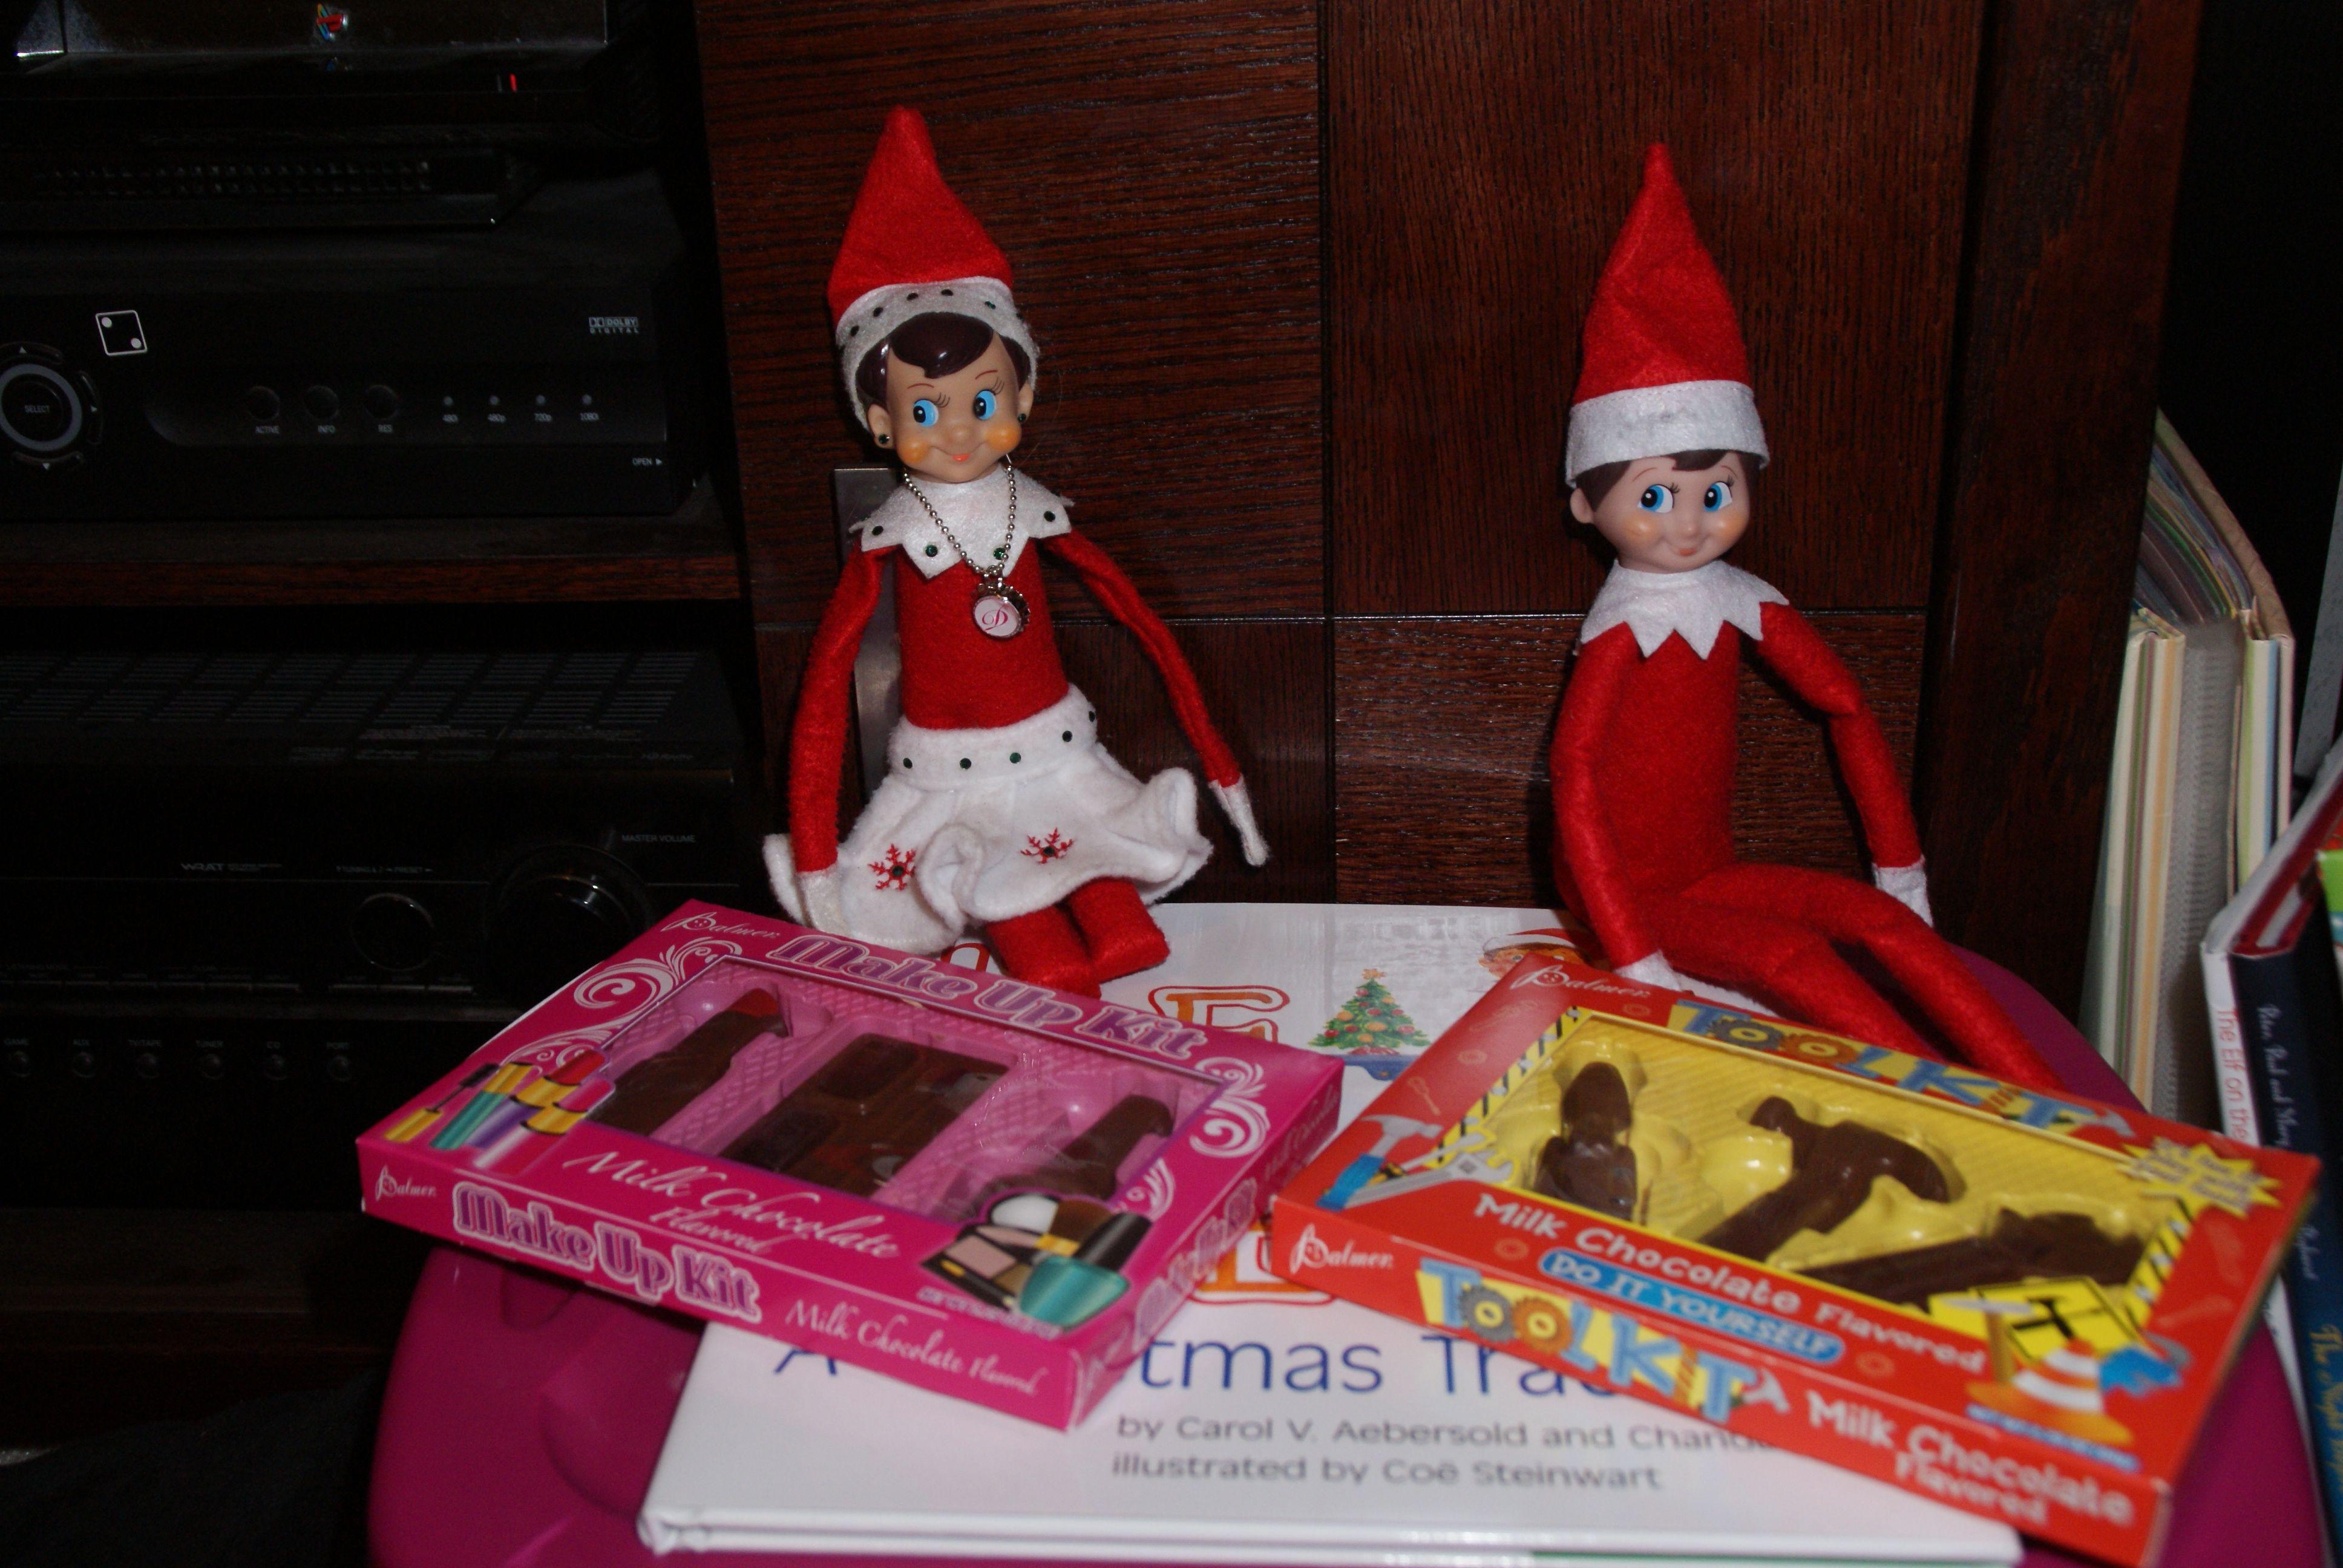 The Elf on the Shelf : who loves chocolate? the elves do